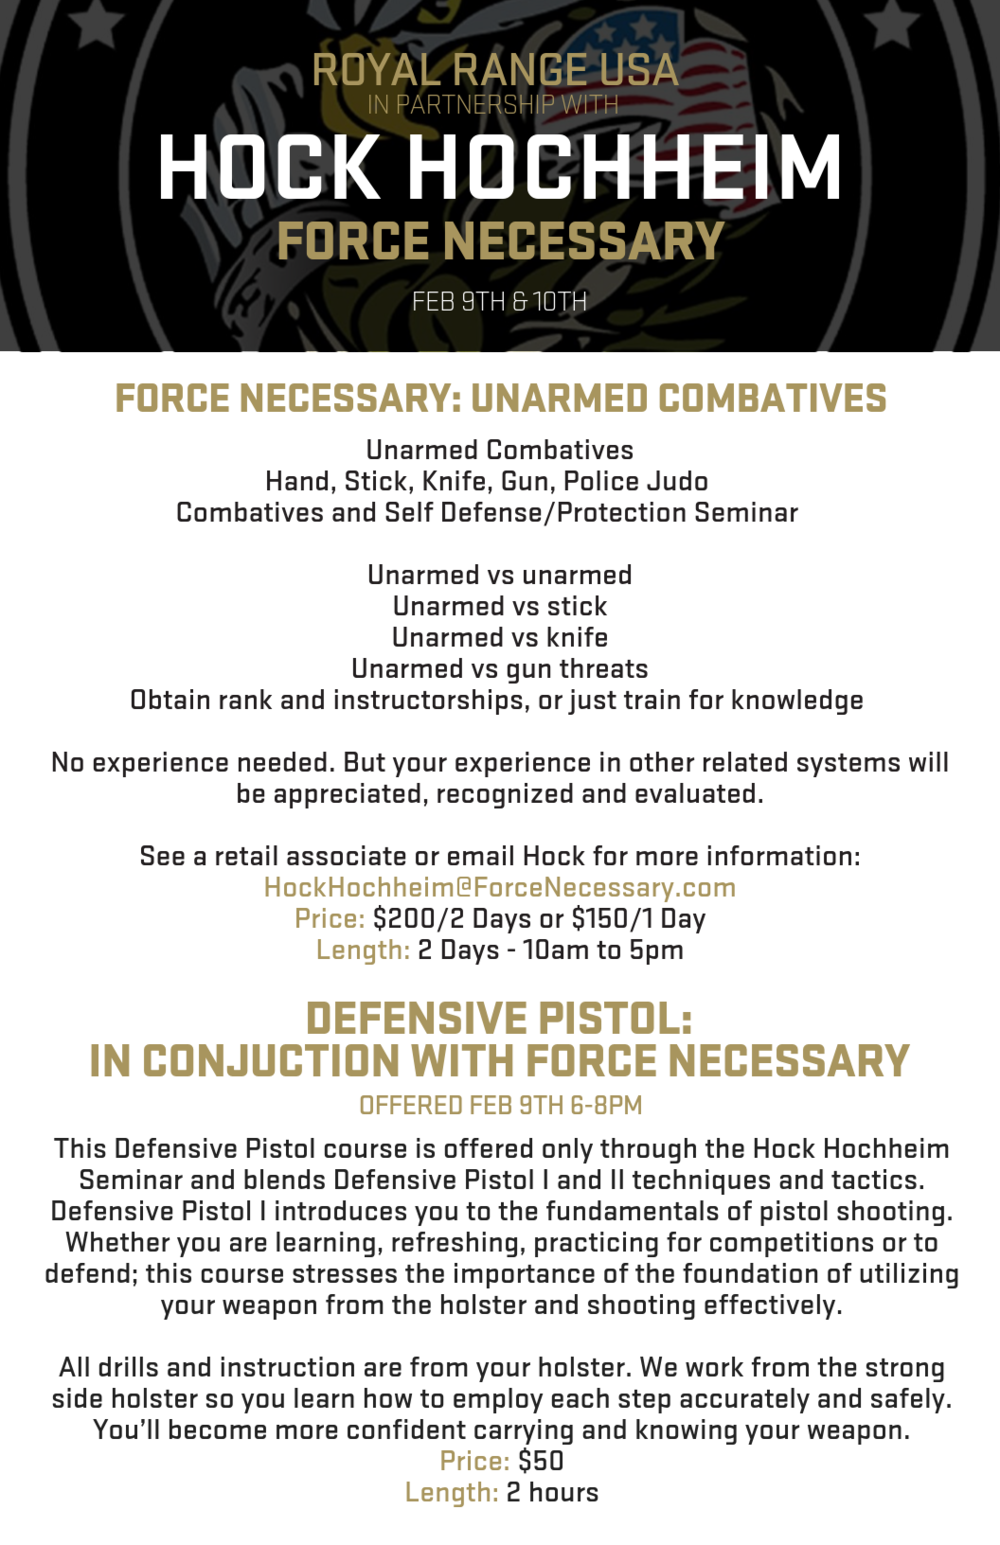 hock-hochheim-force-necessary-seminar.jpg